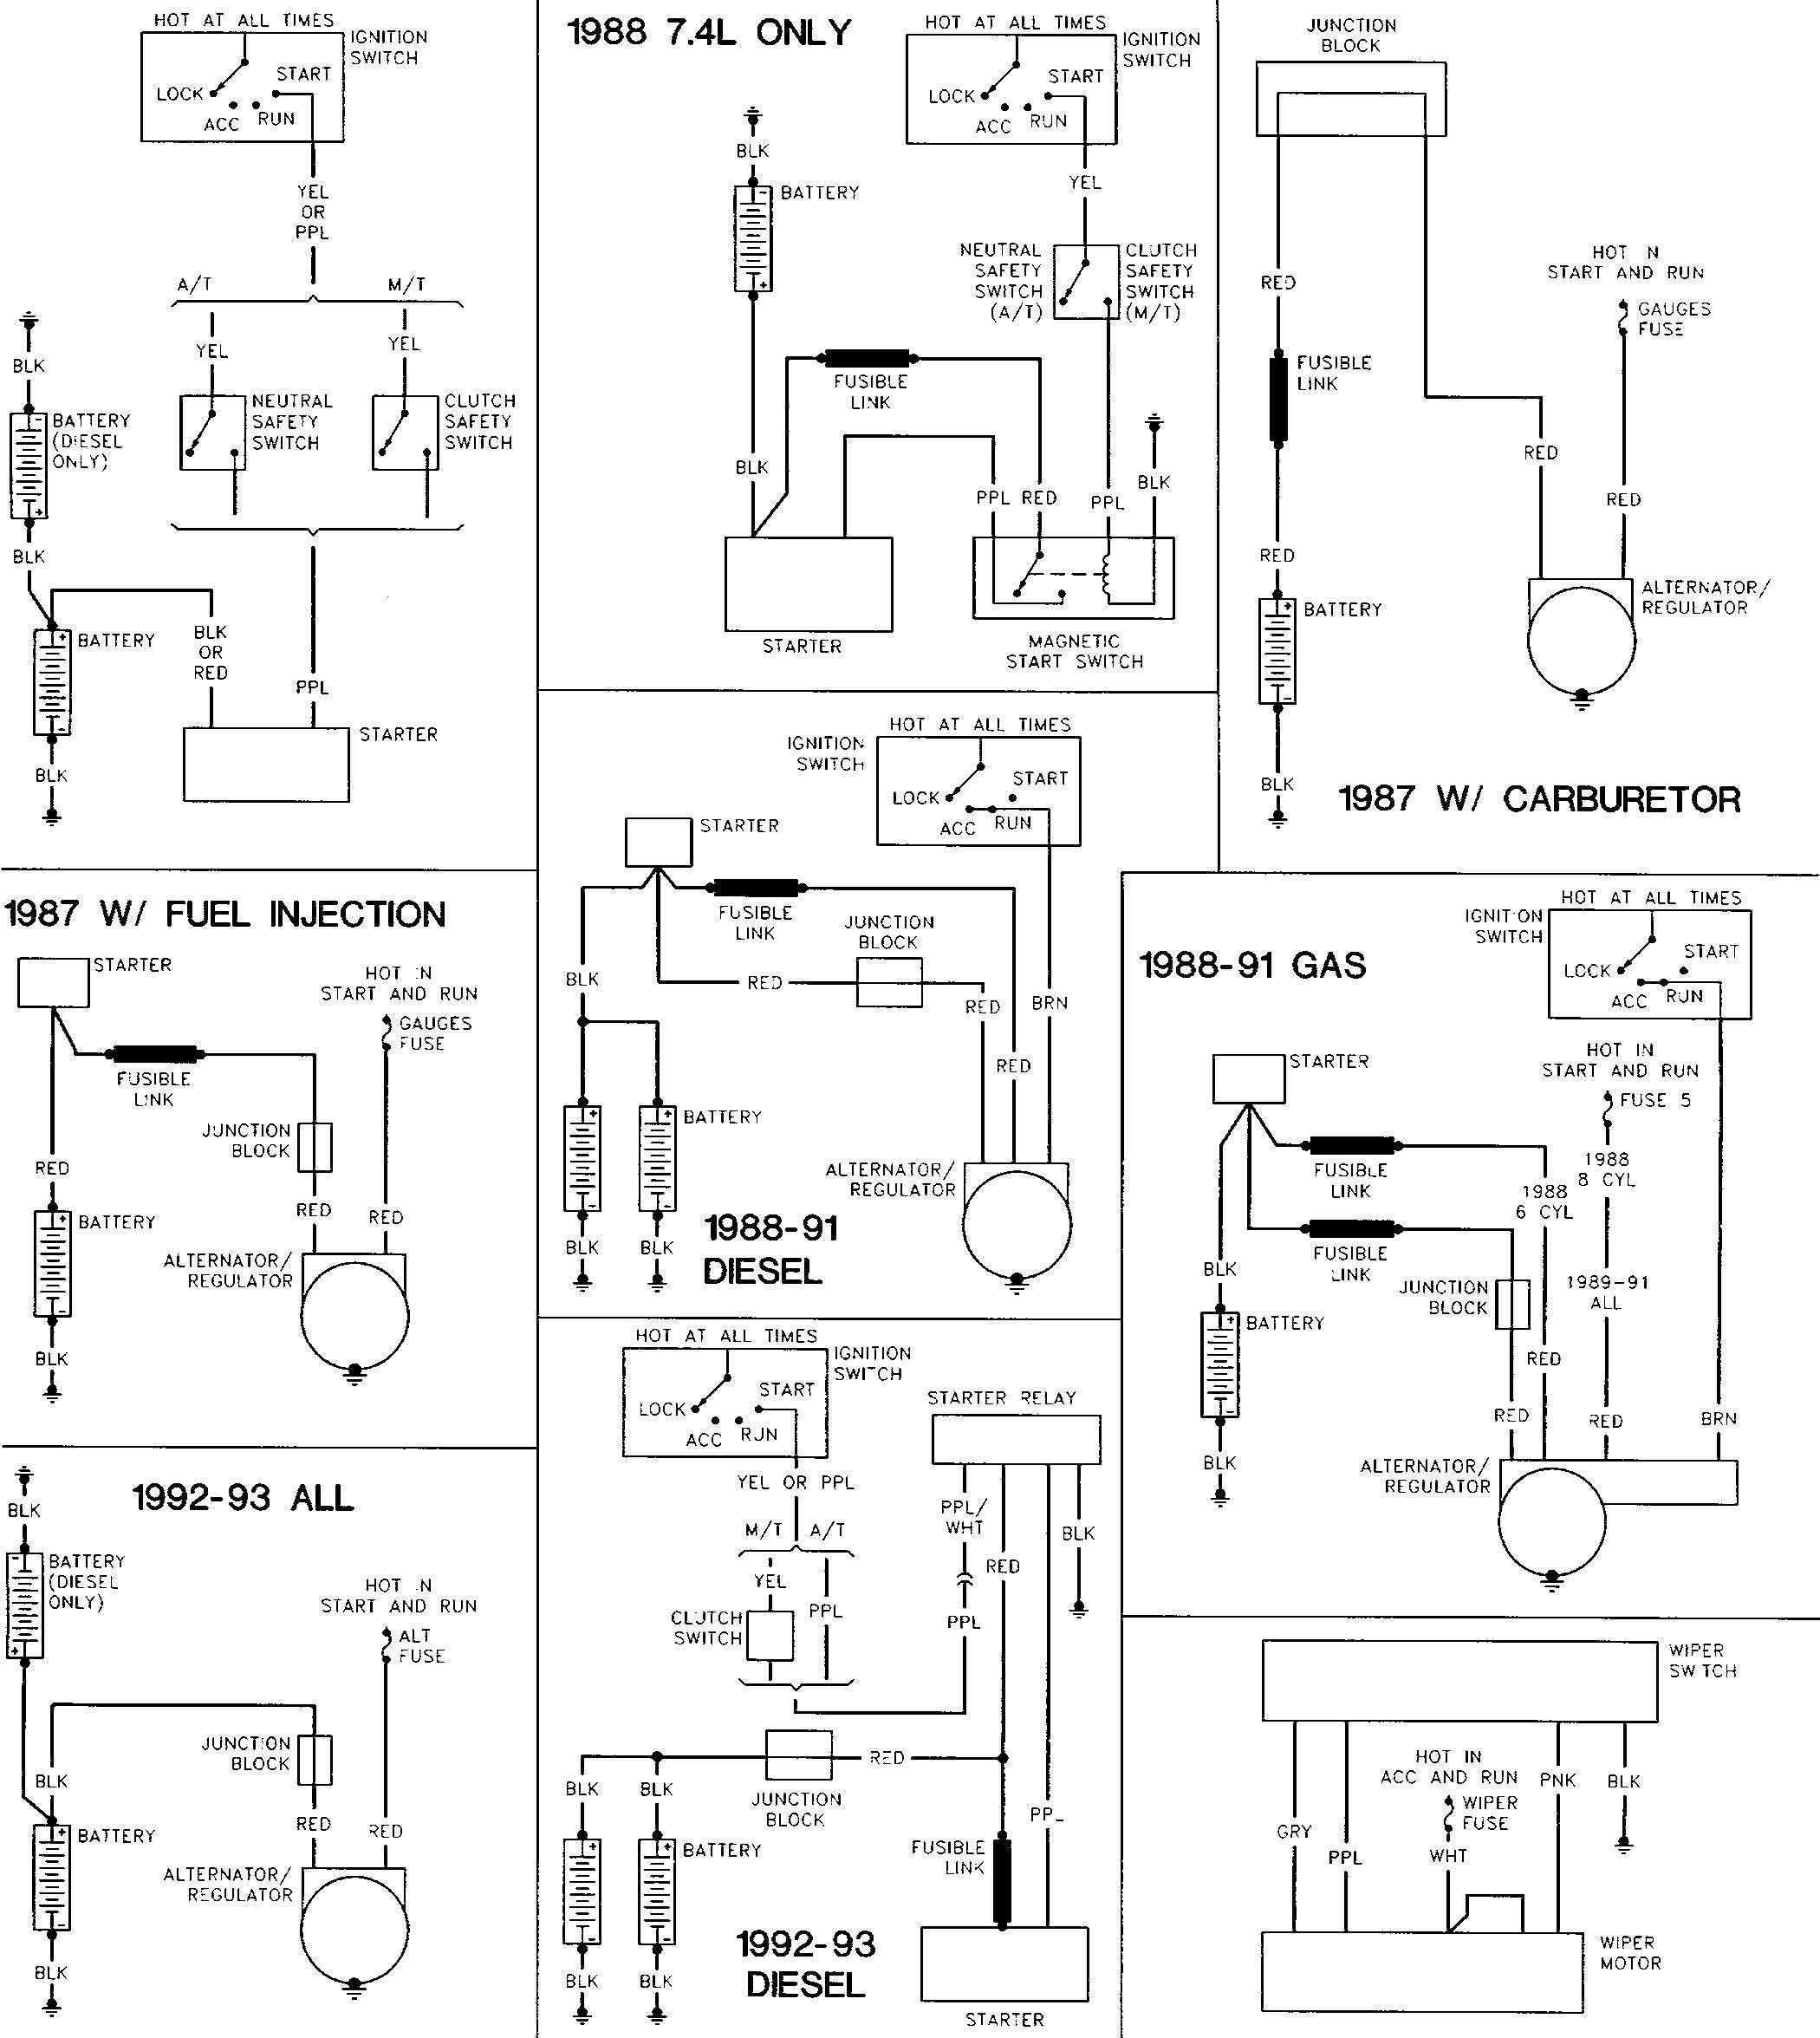 1999 Fleetwood Rv Wiring Diagram - Wiring Diagram Data - Fleetwood Rv Wiring Diagram